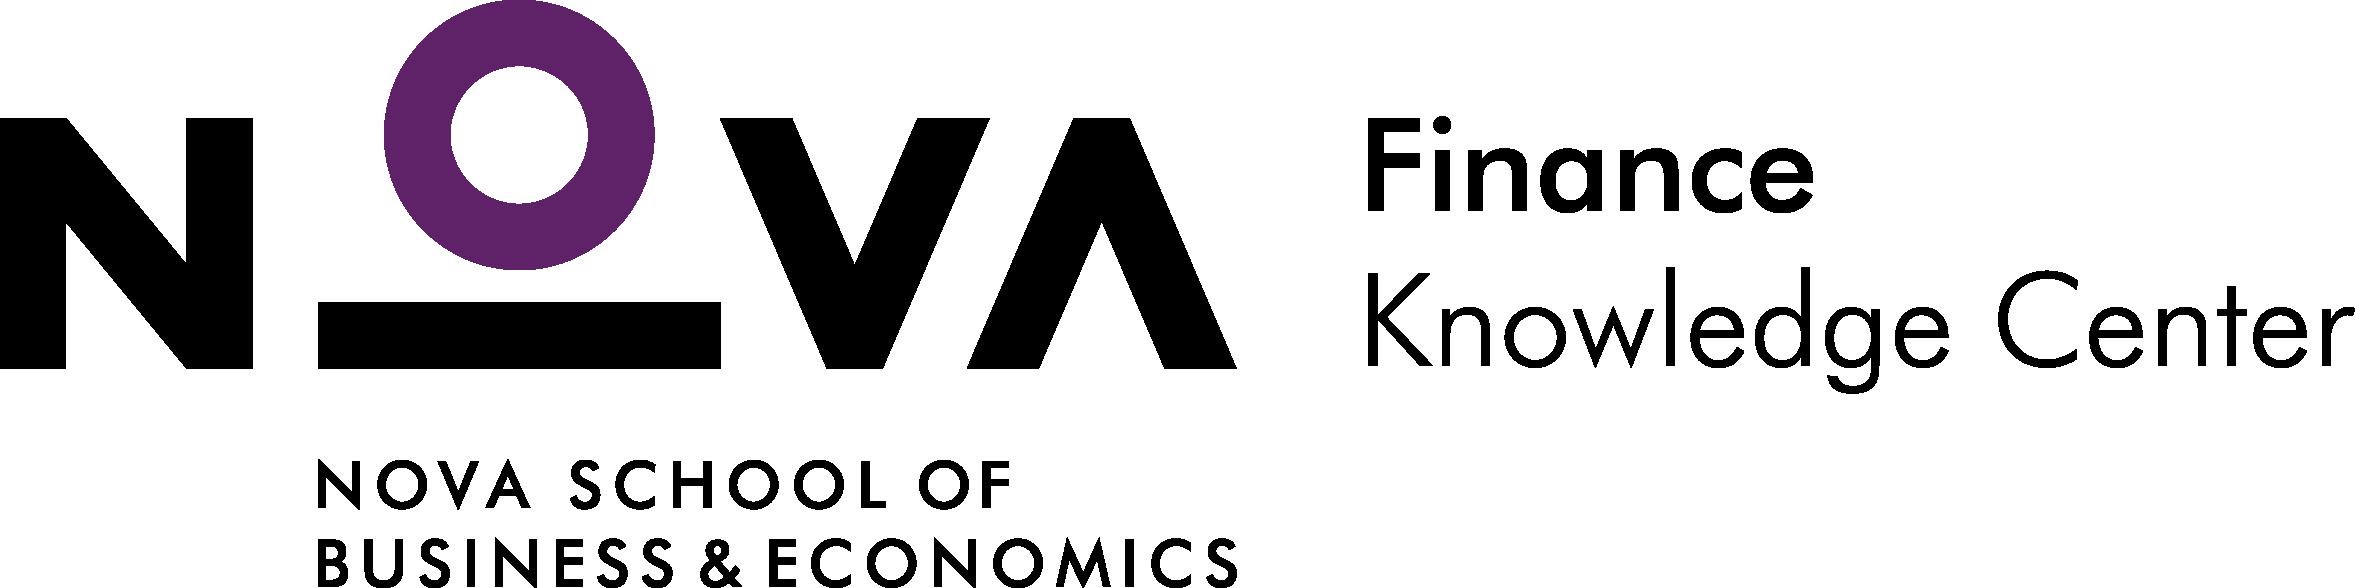 Nova SBE Finance Knowledge Center logo